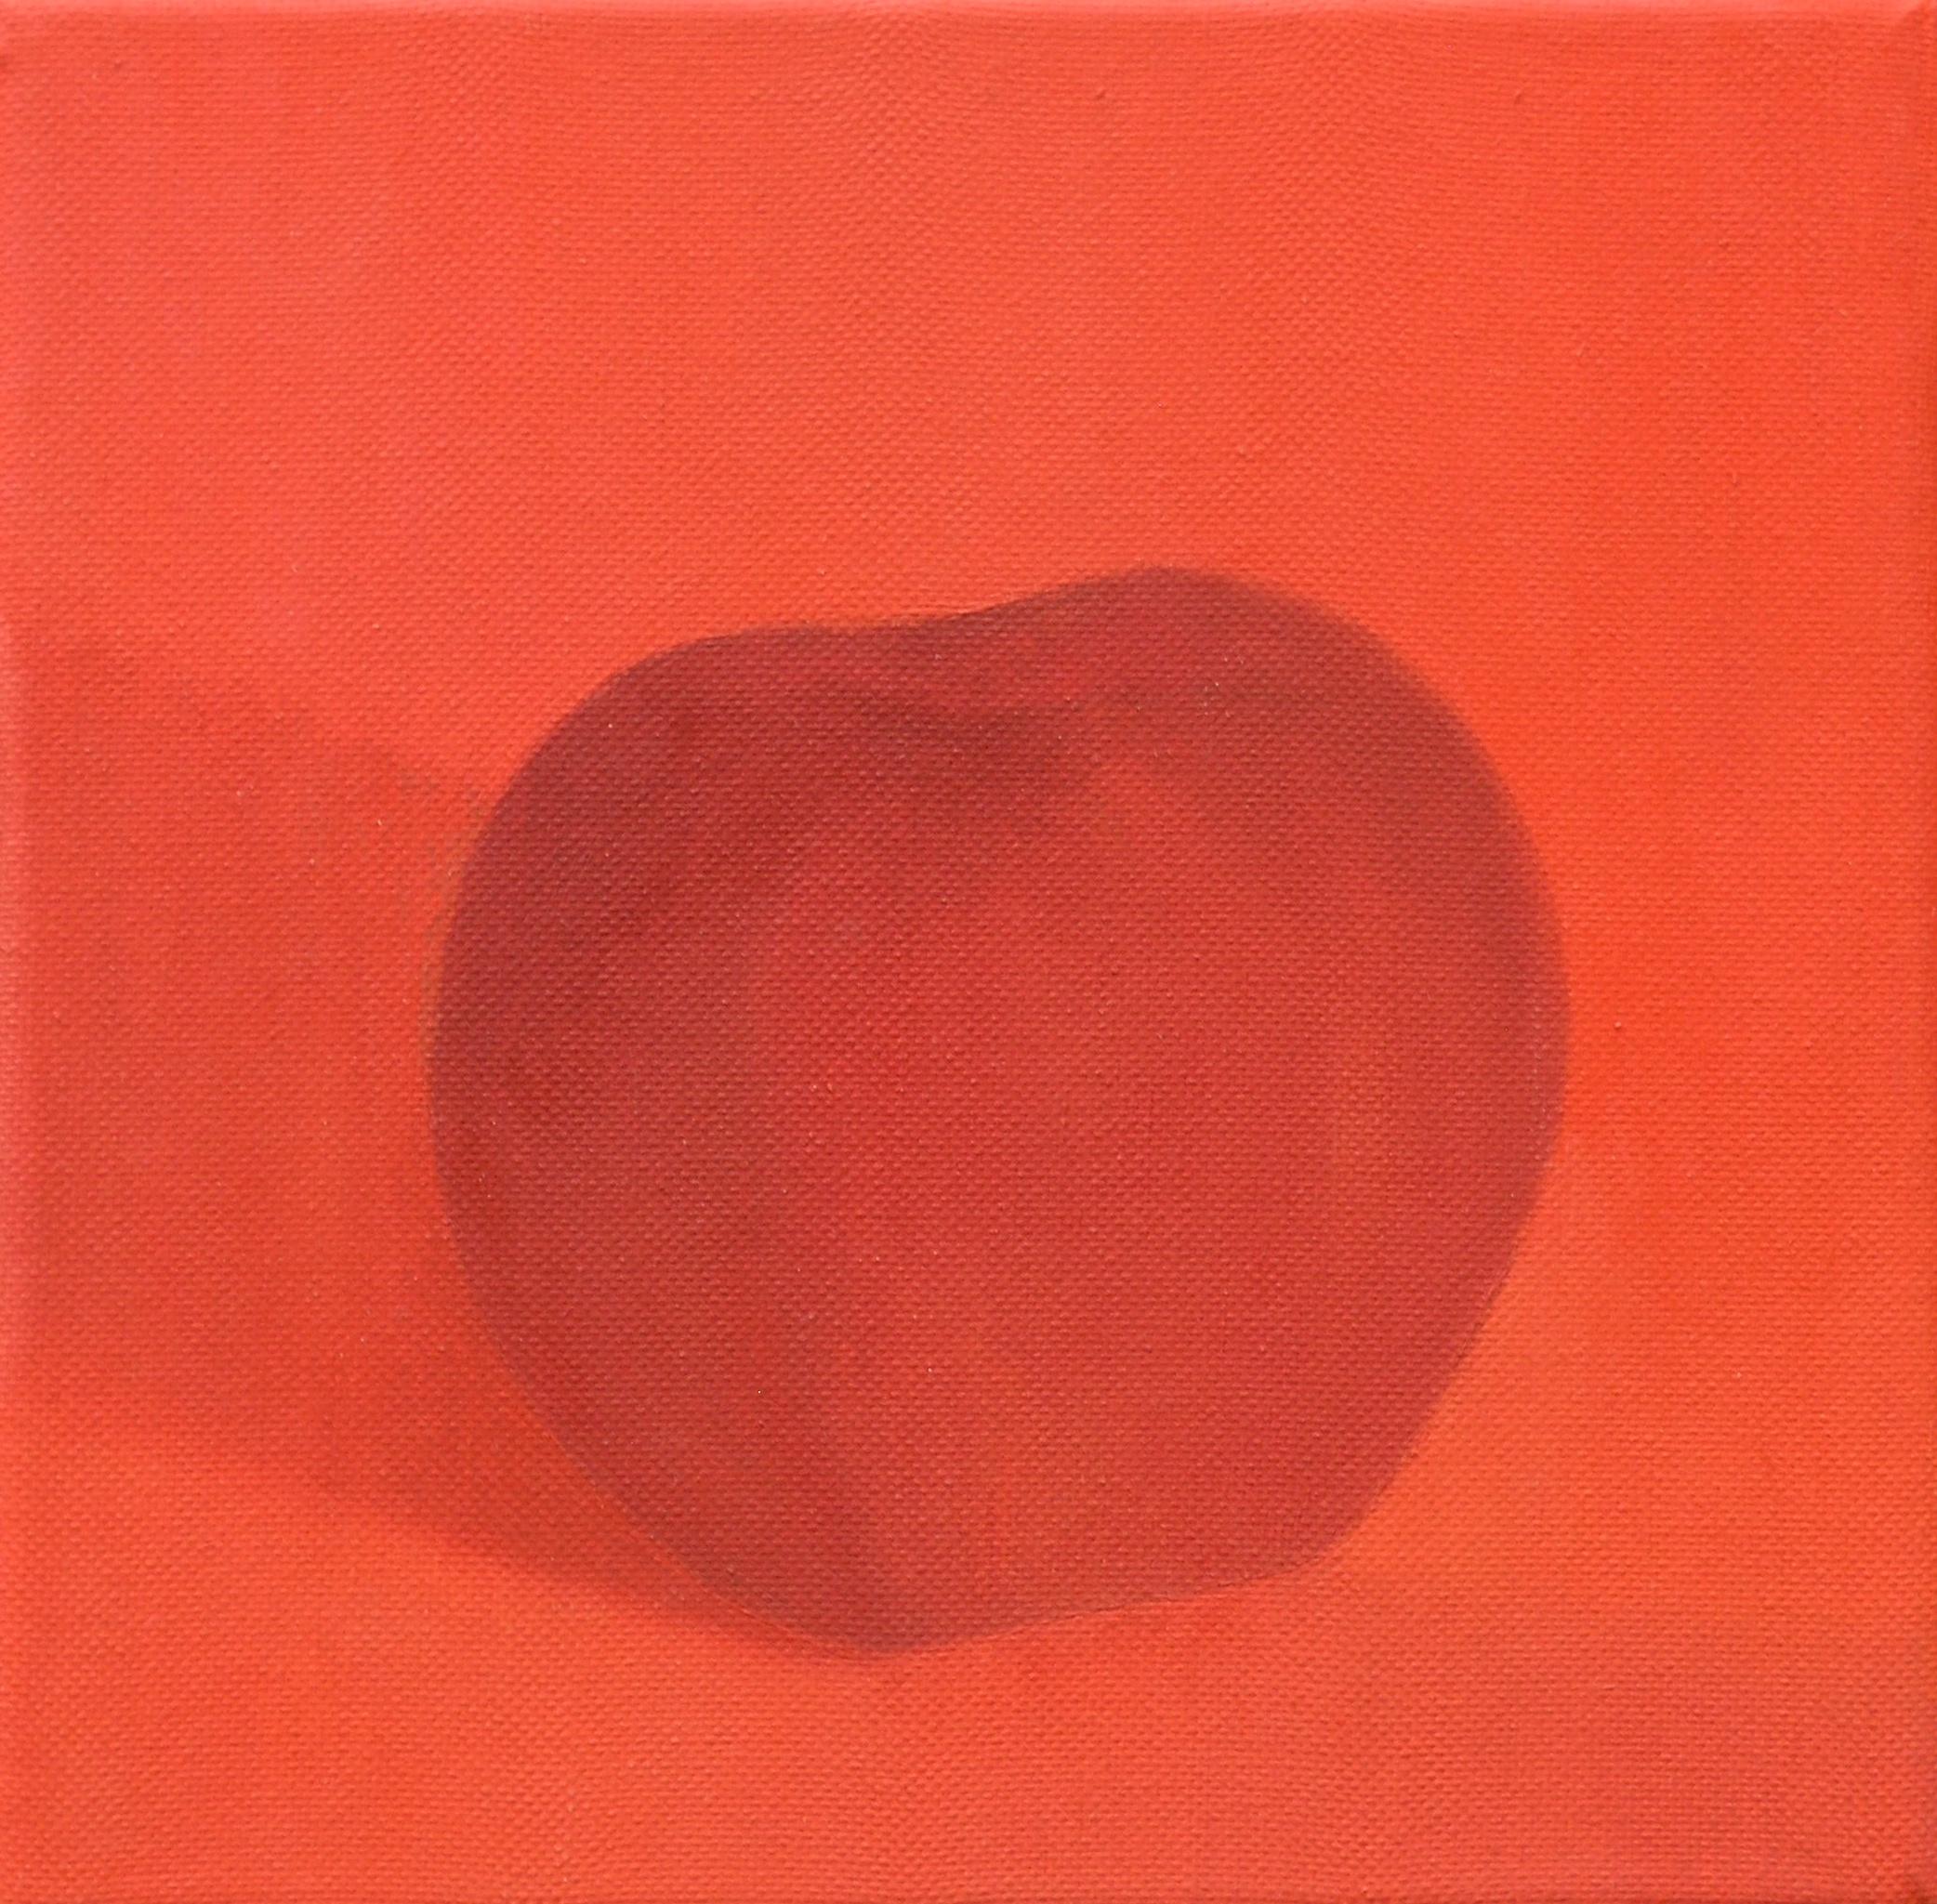 Flat apple 1